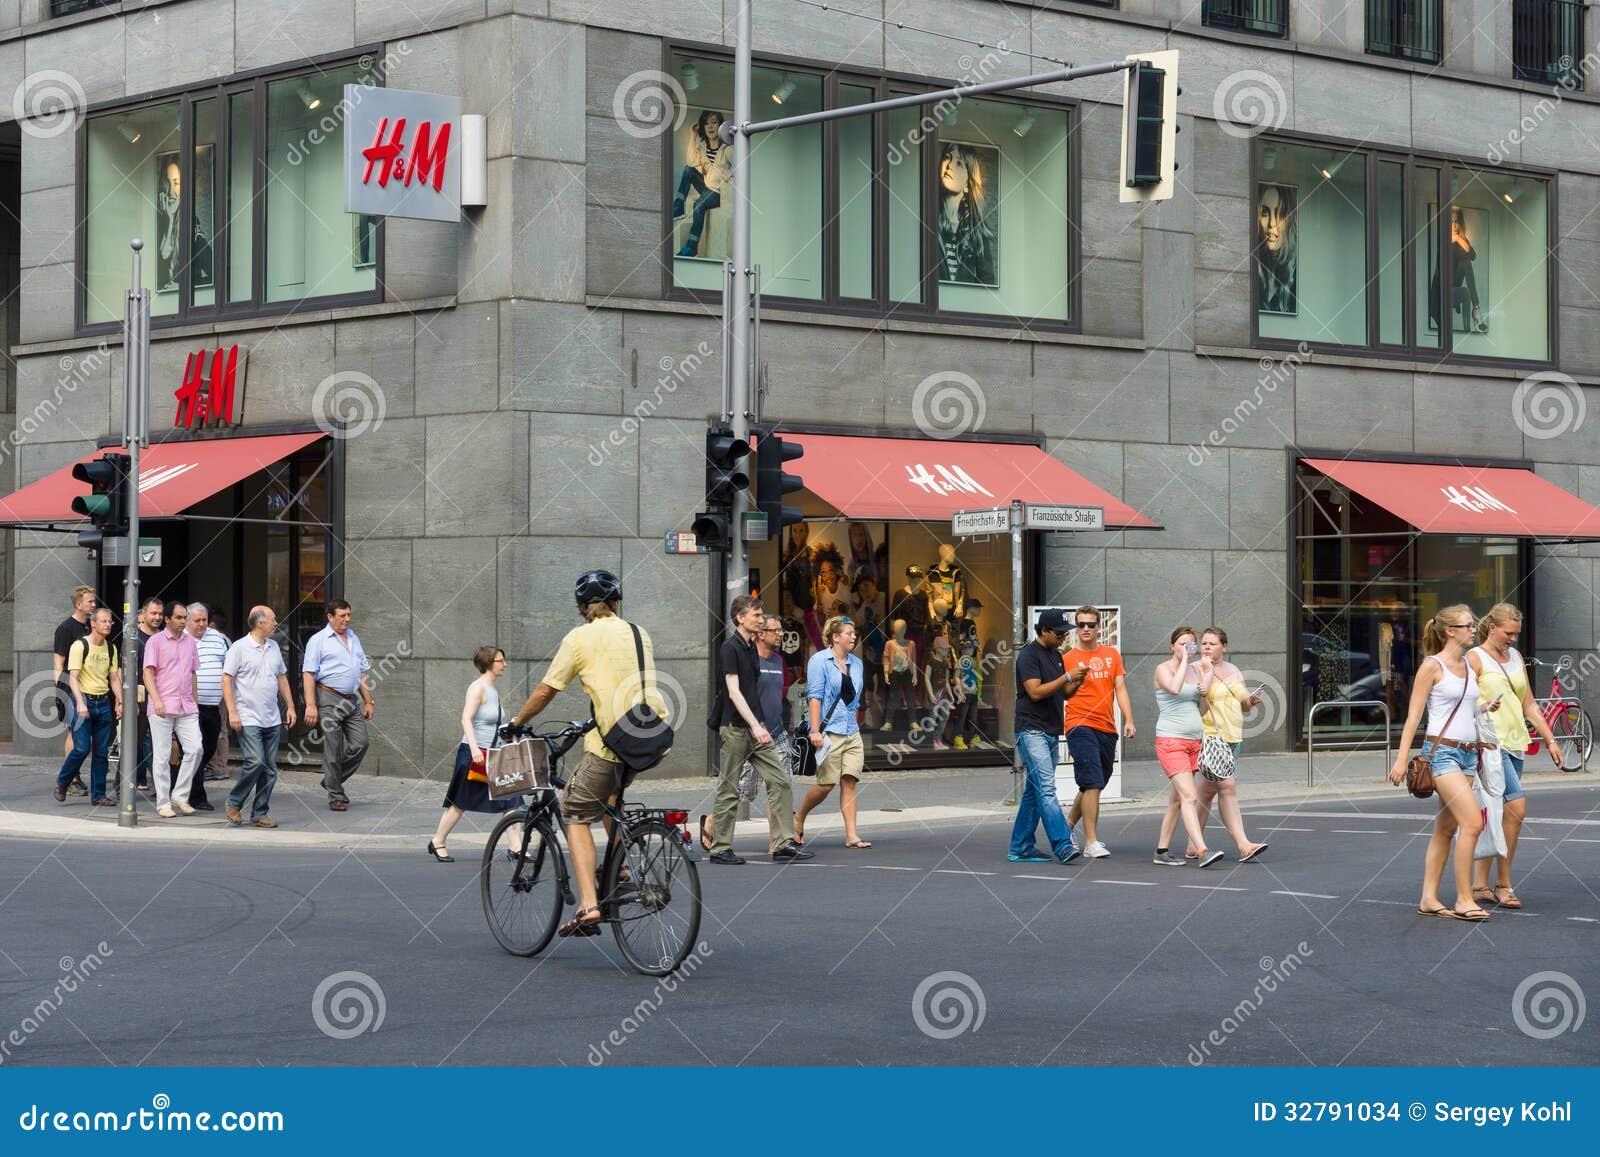 h m store on friedrichstrasse editorial stock image. Black Bedroom Furniture Sets. Home Design Ideas